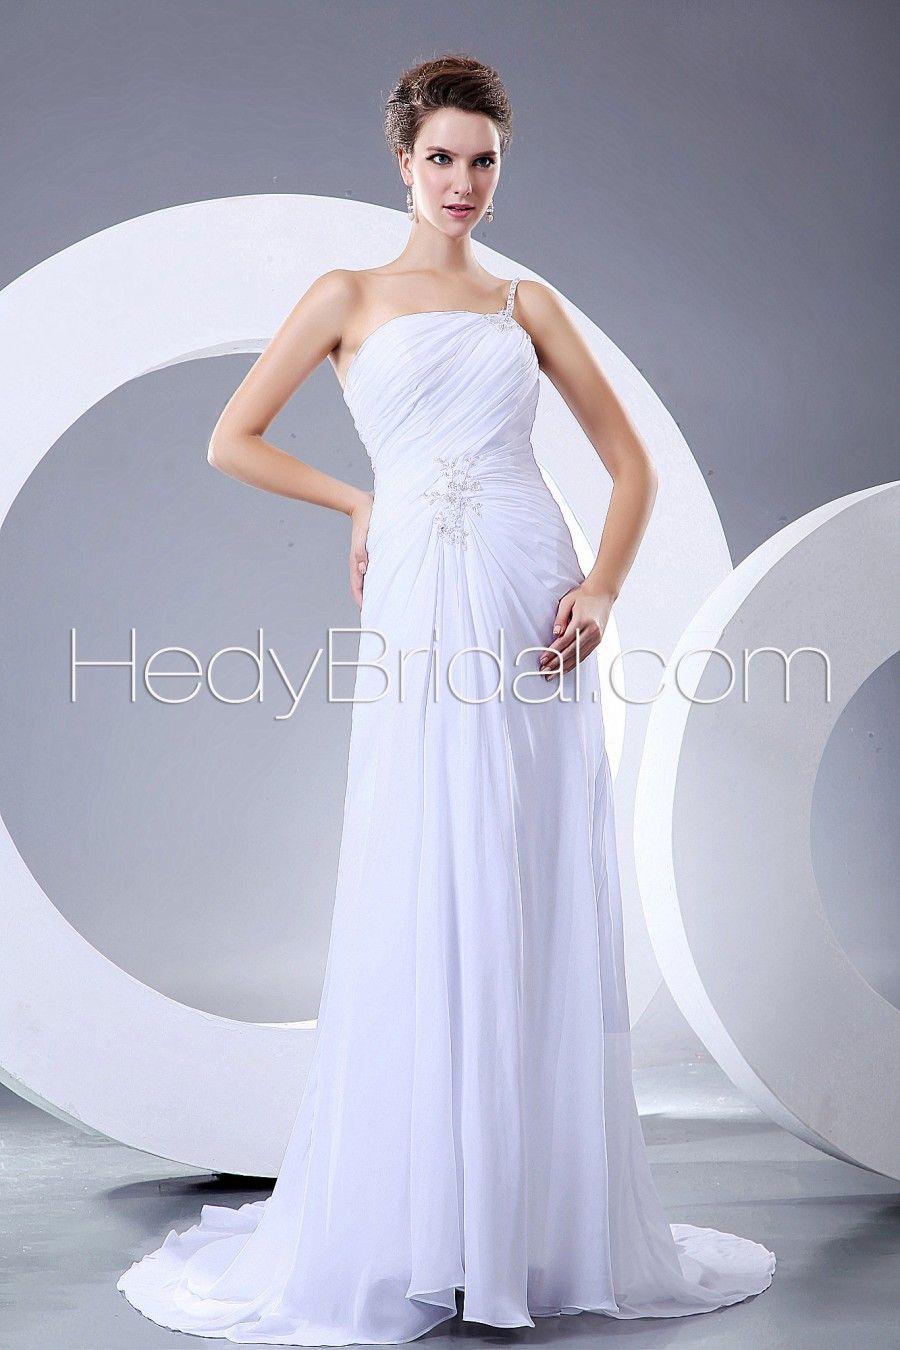 Wedding dresses for big women  Sammy Gown   Wedding Dresses  Pinterest  Bridal gowns